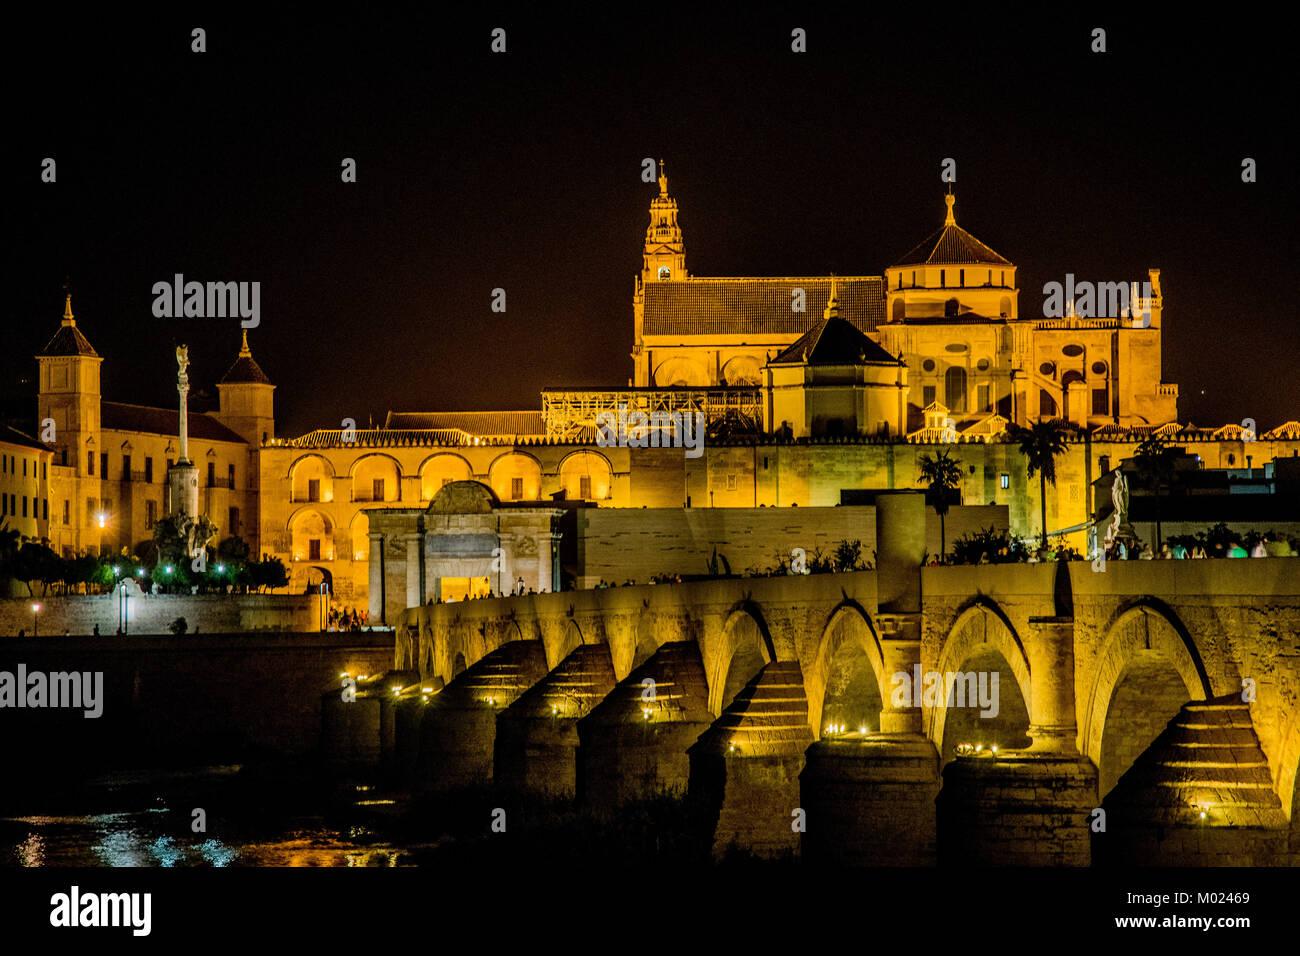 CORDOBA, ANDALUSIA / SPAIN - OCTOBER 14 2017: NIGHT VIEW ON OLD ROMAN BRIDGE Stock Photo